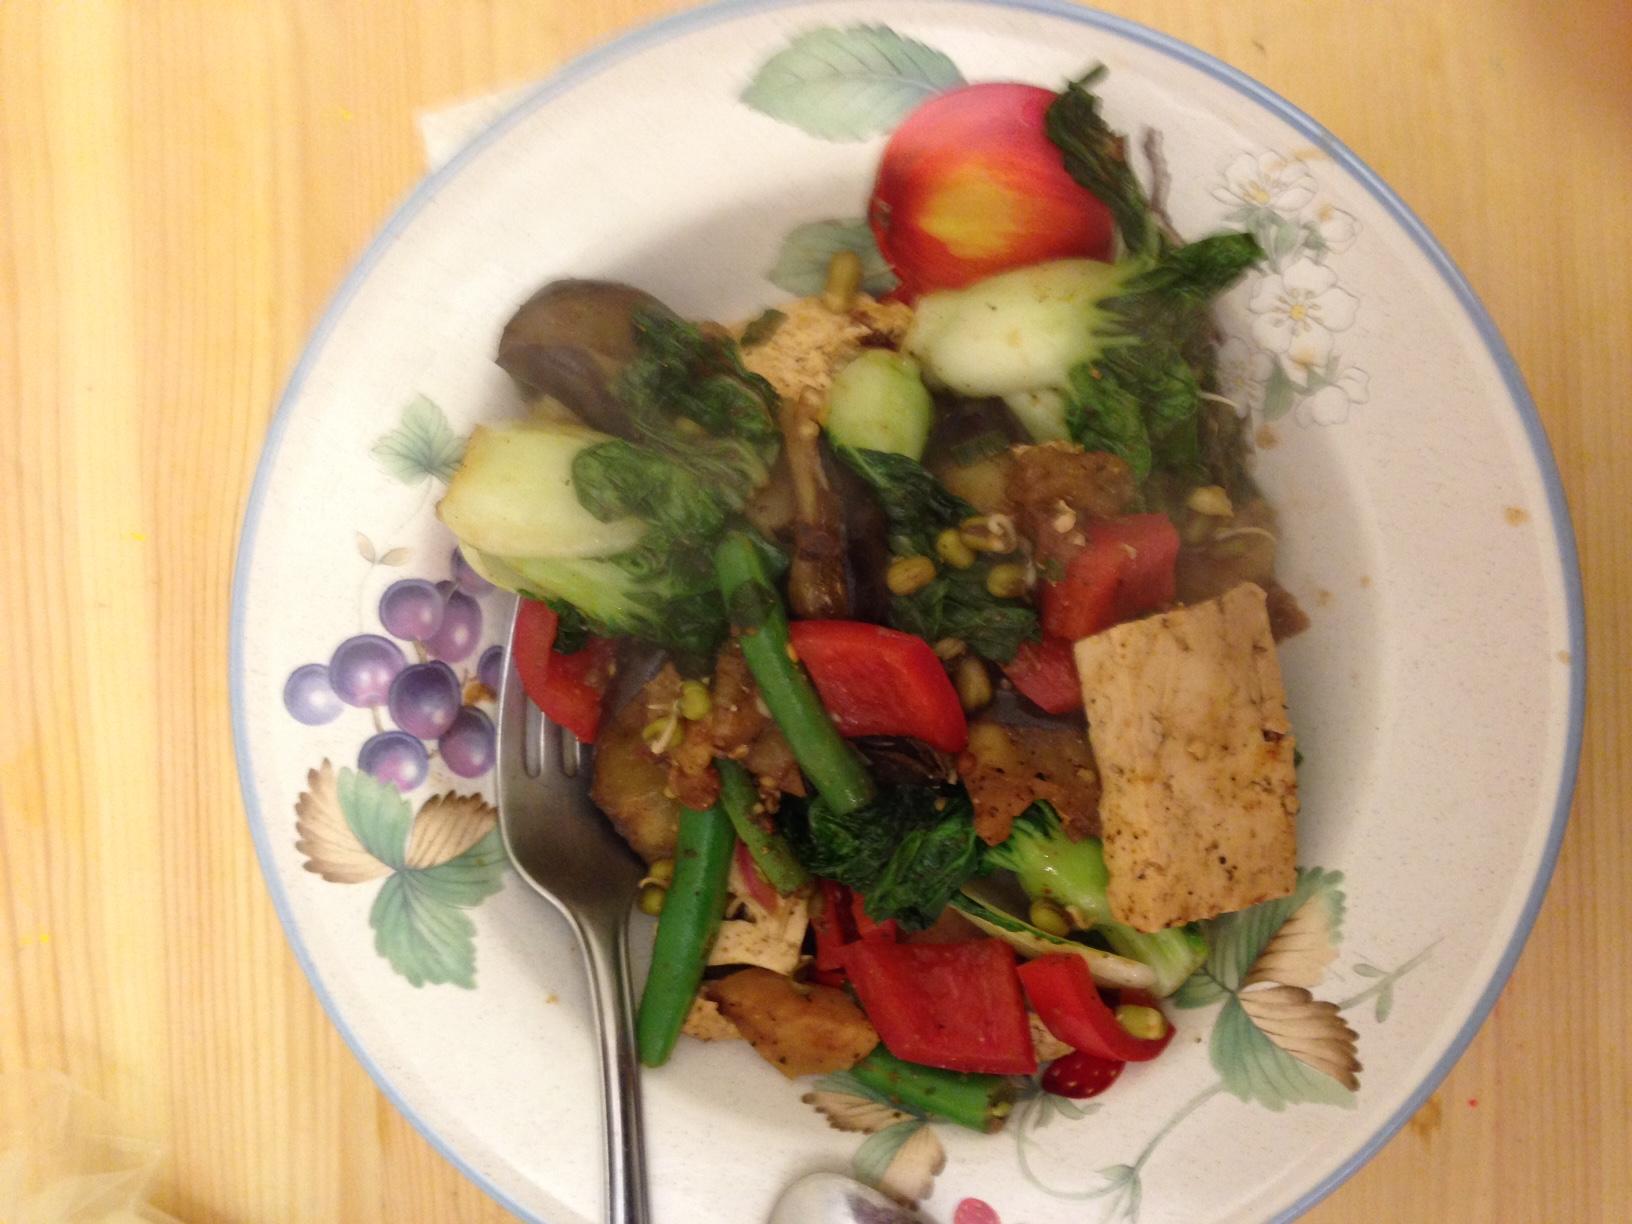 vegan eating food